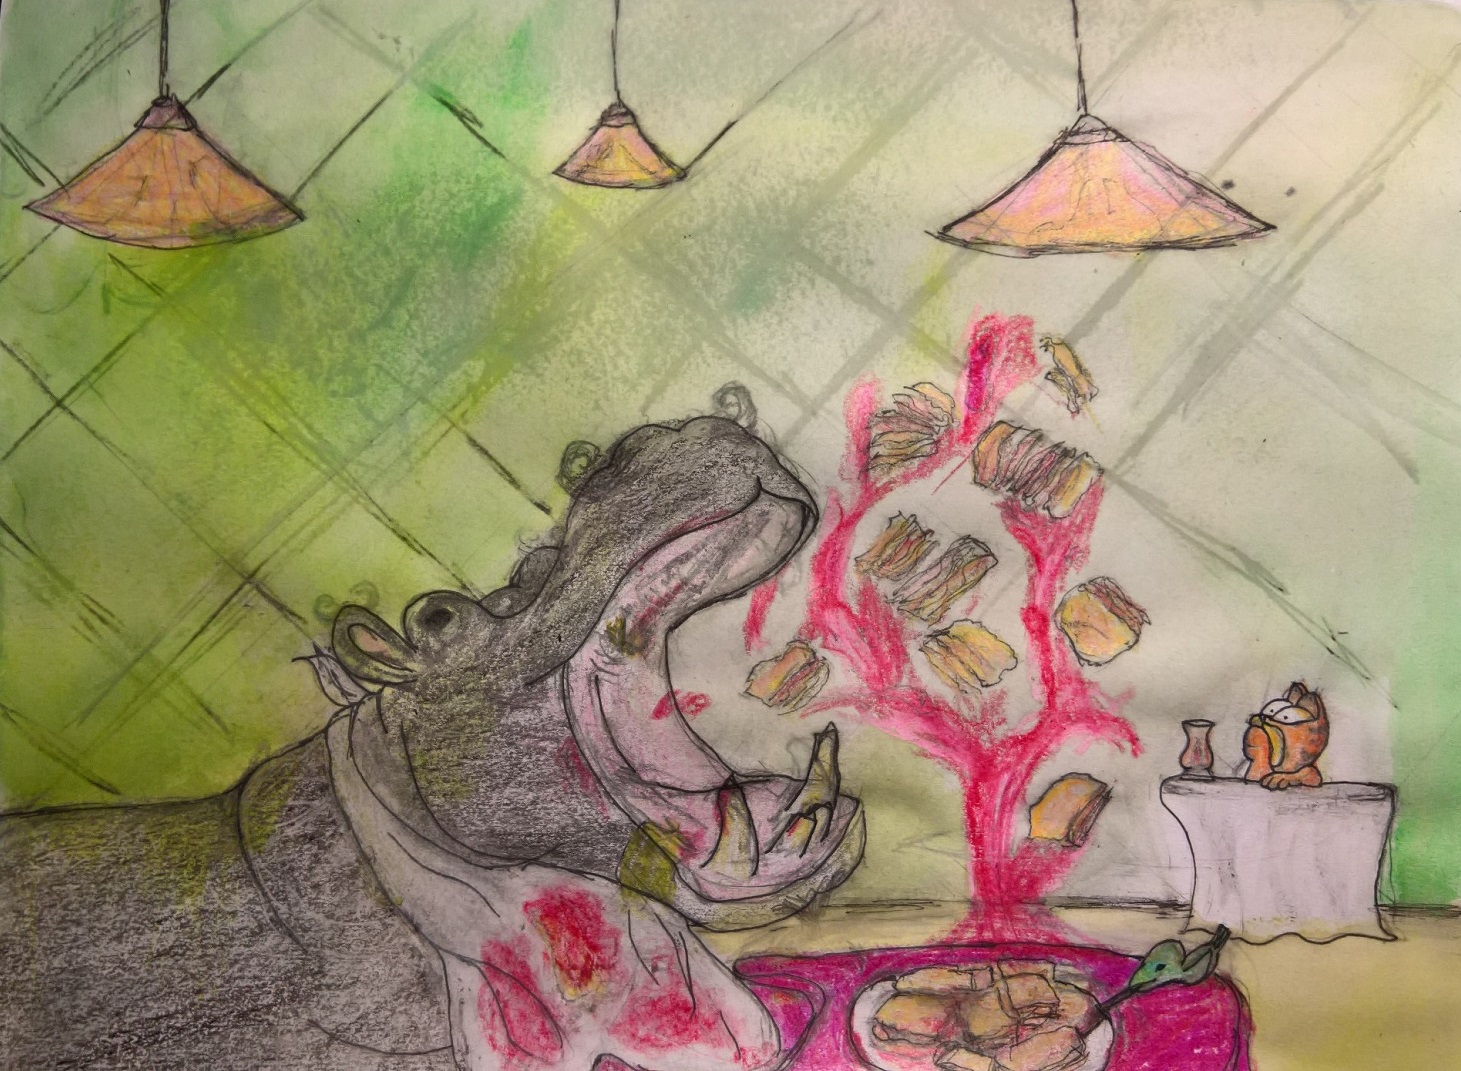 A Hippo Eating Lasagna